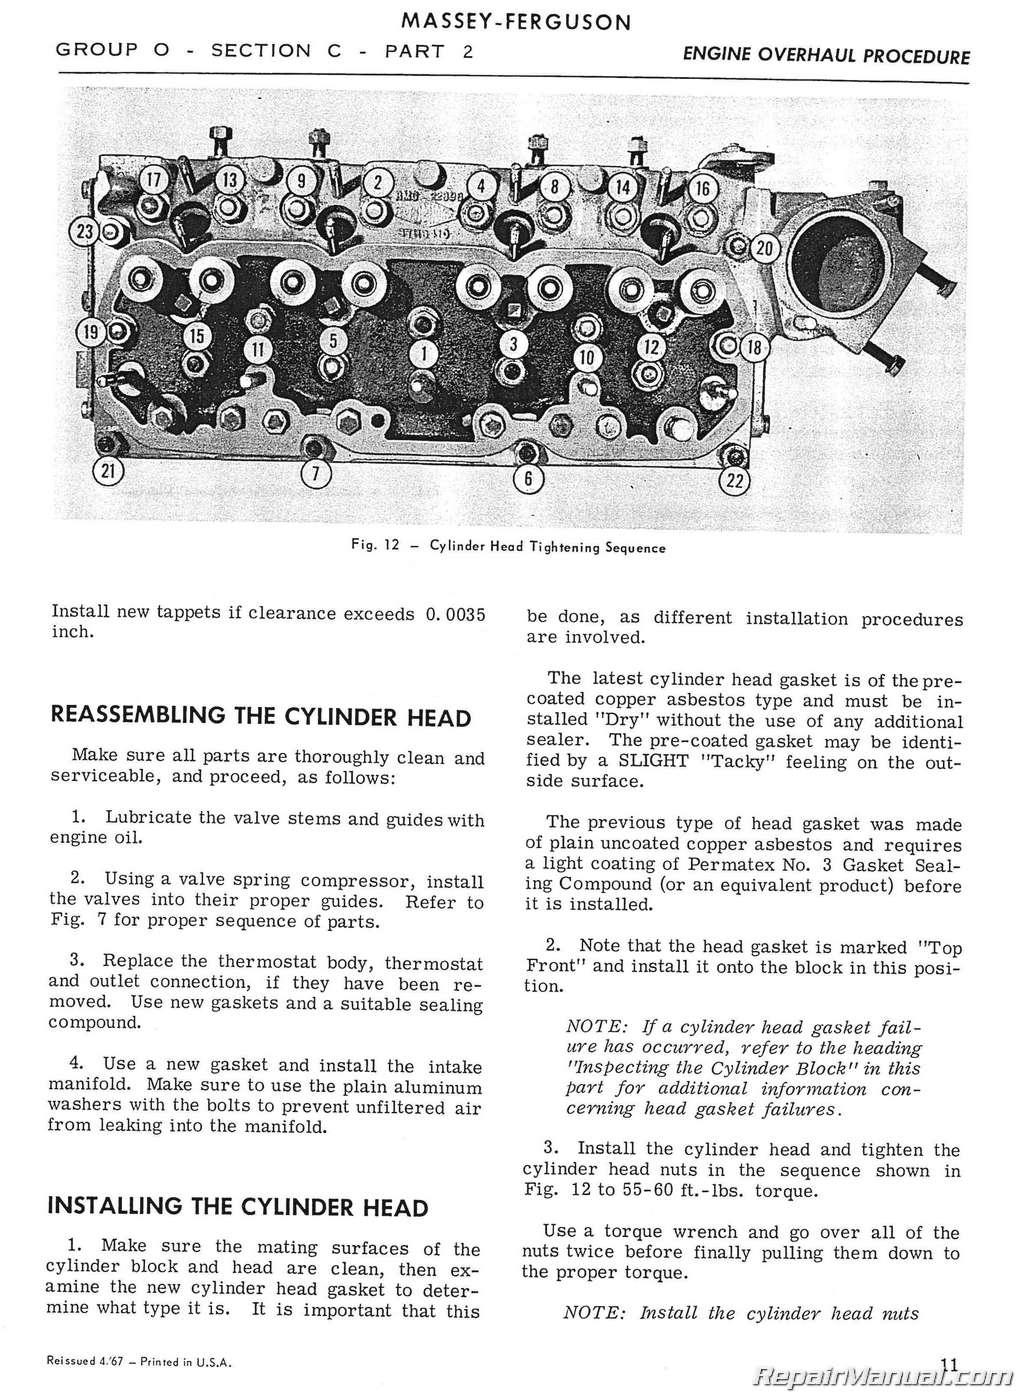 Massey Ferguson 302 Wiring Diagram Not Lossing To 30 Mf 304 Tractor 320 Backhoe Service Manual Rh Repairmanual Com Bucket Gauge